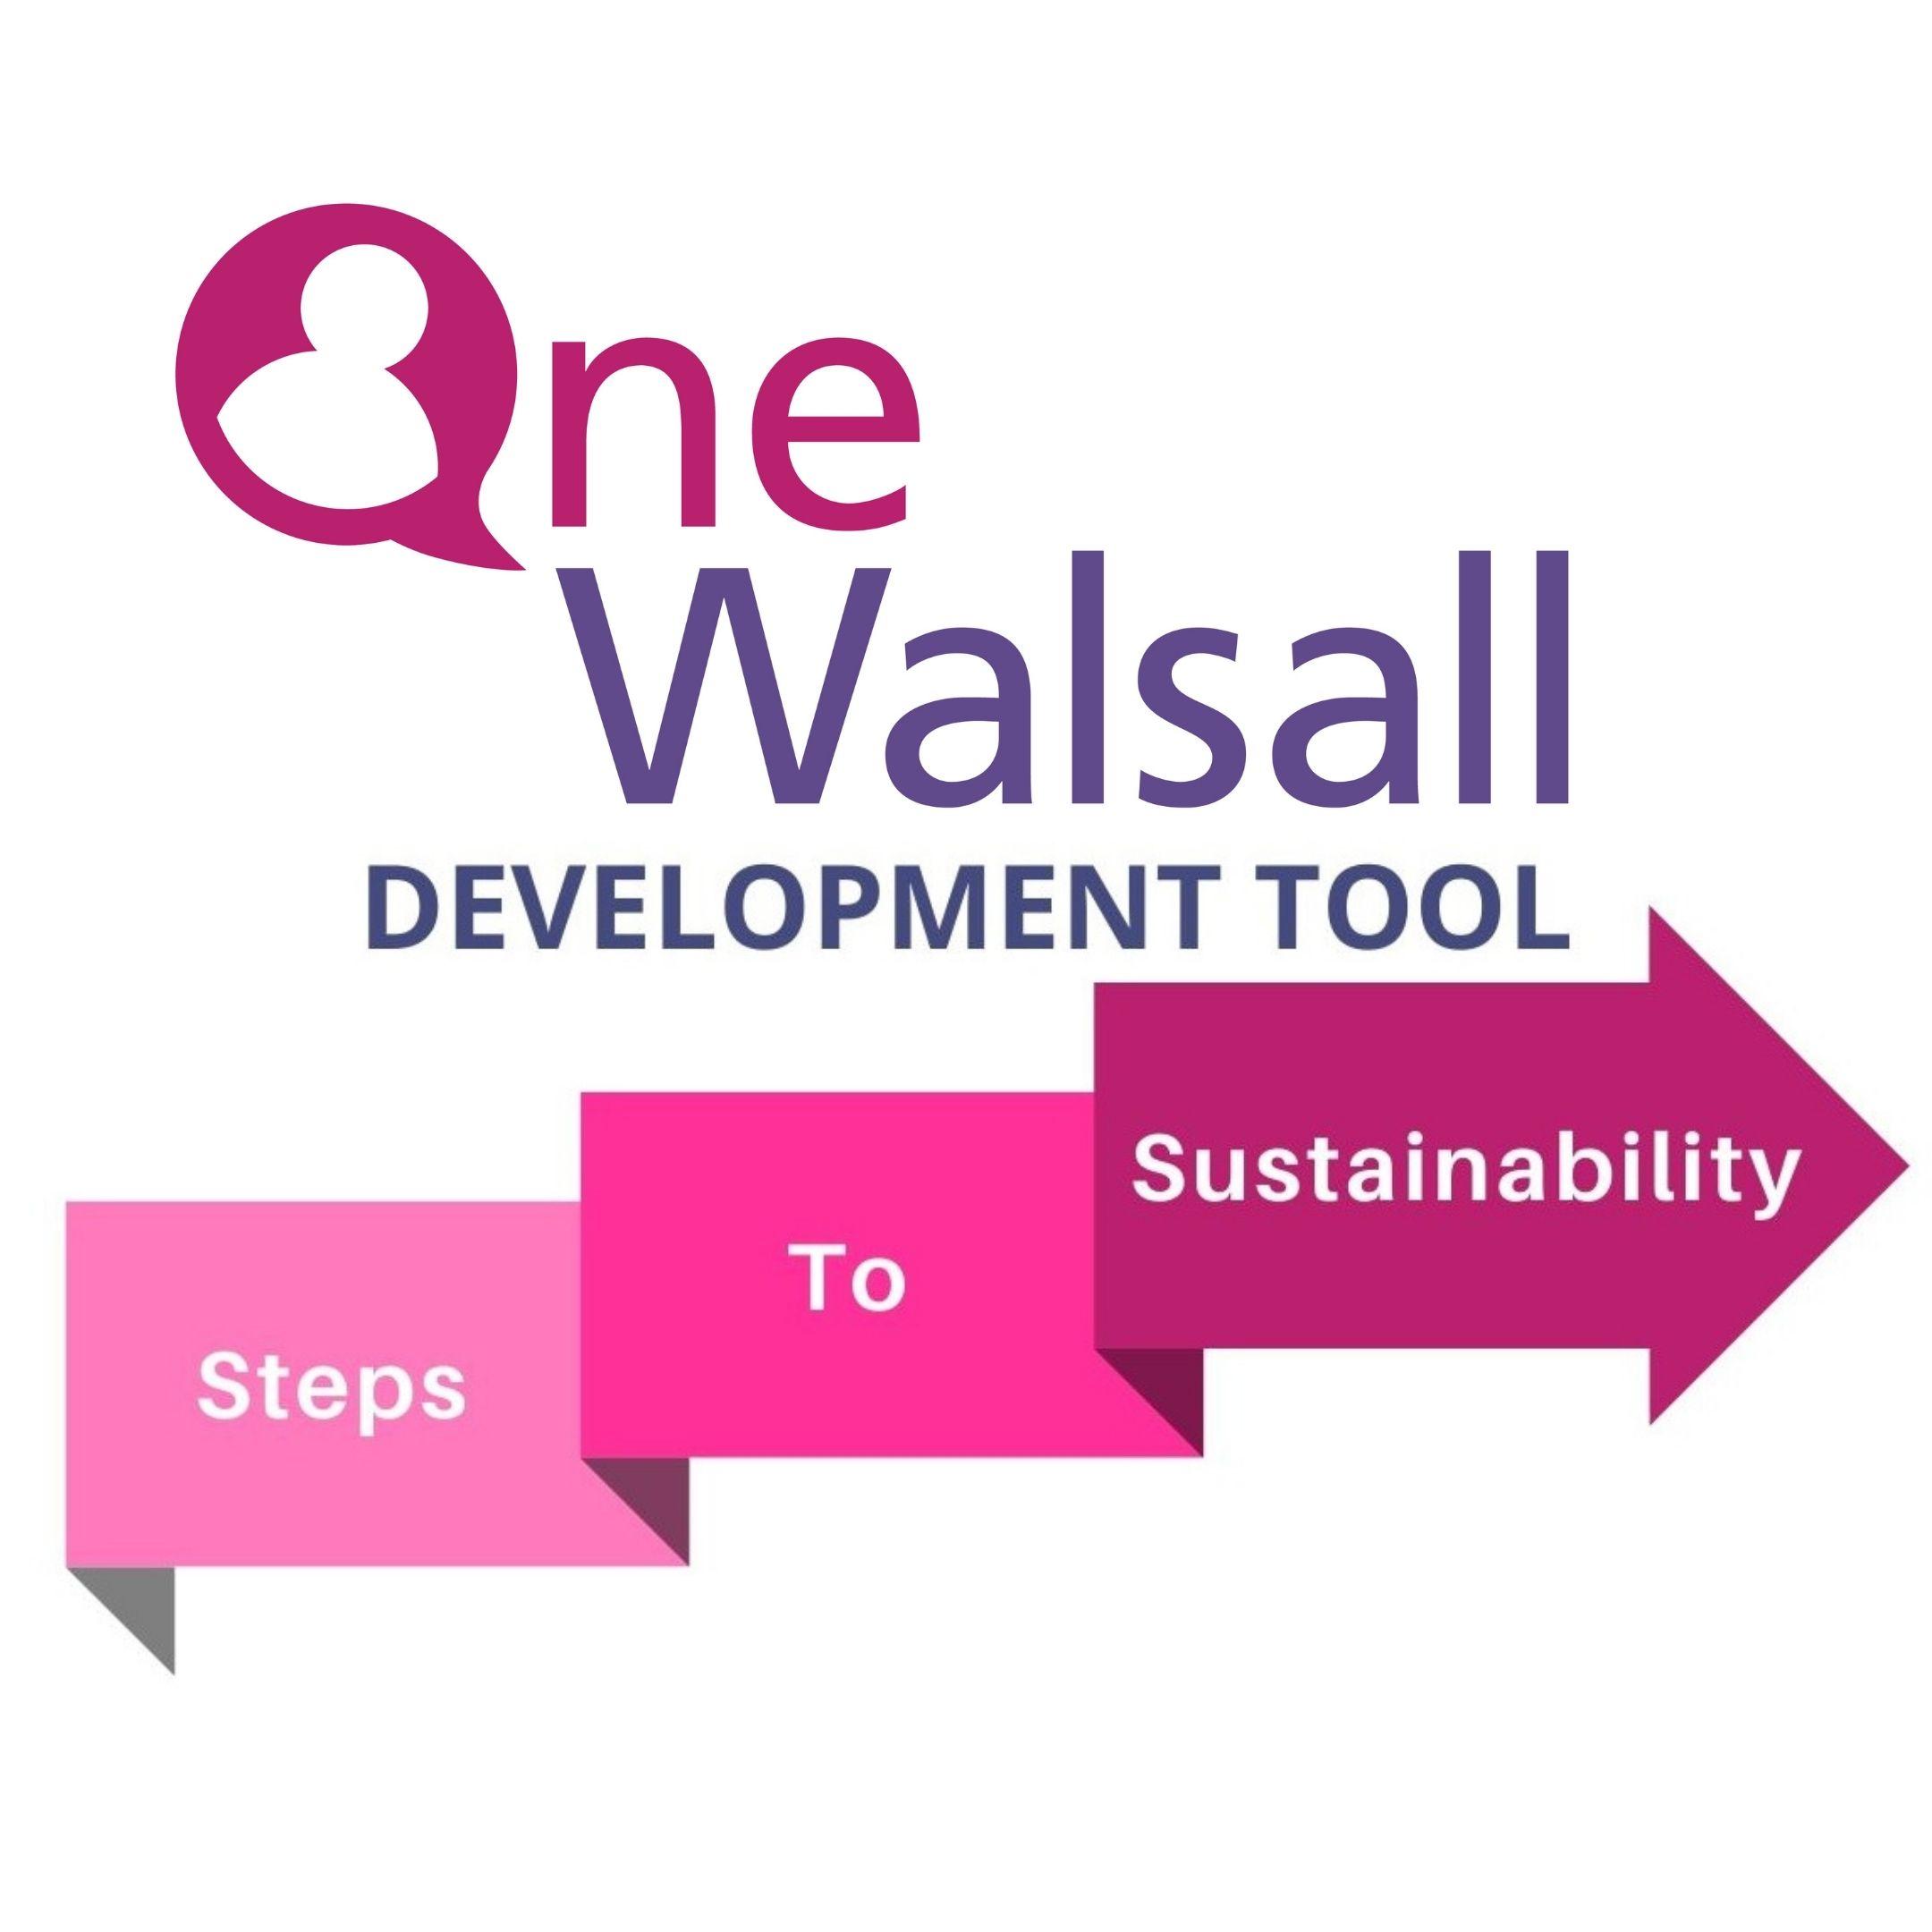 steps to sustainability logo (2)